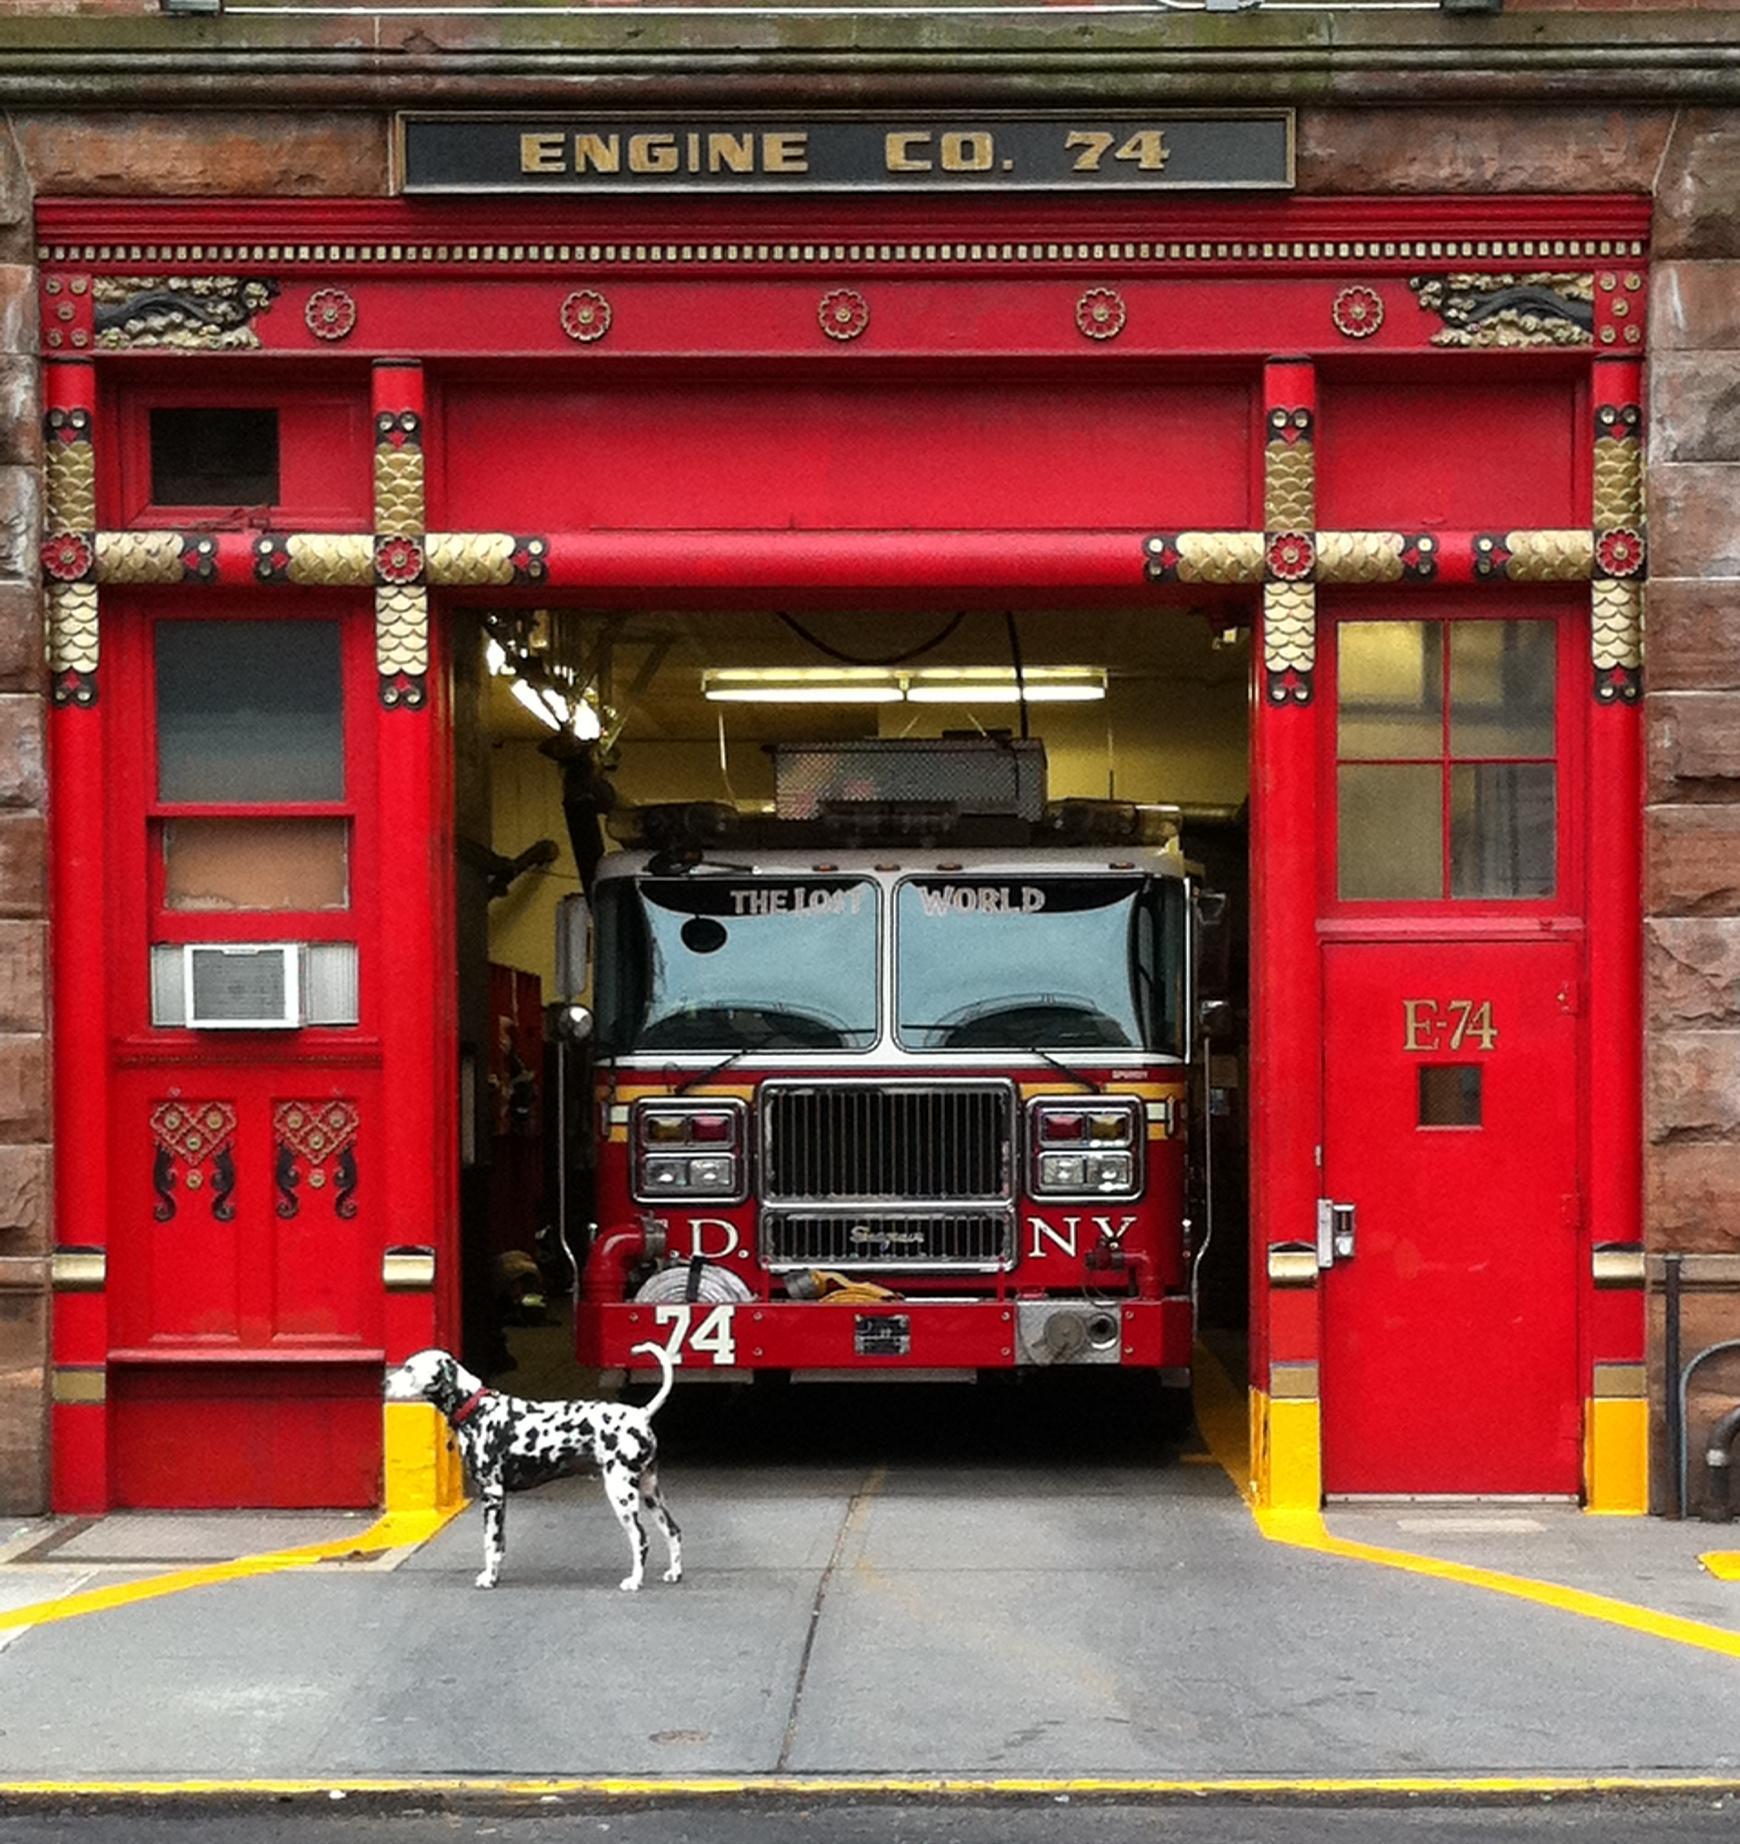 The Firehouse Principle